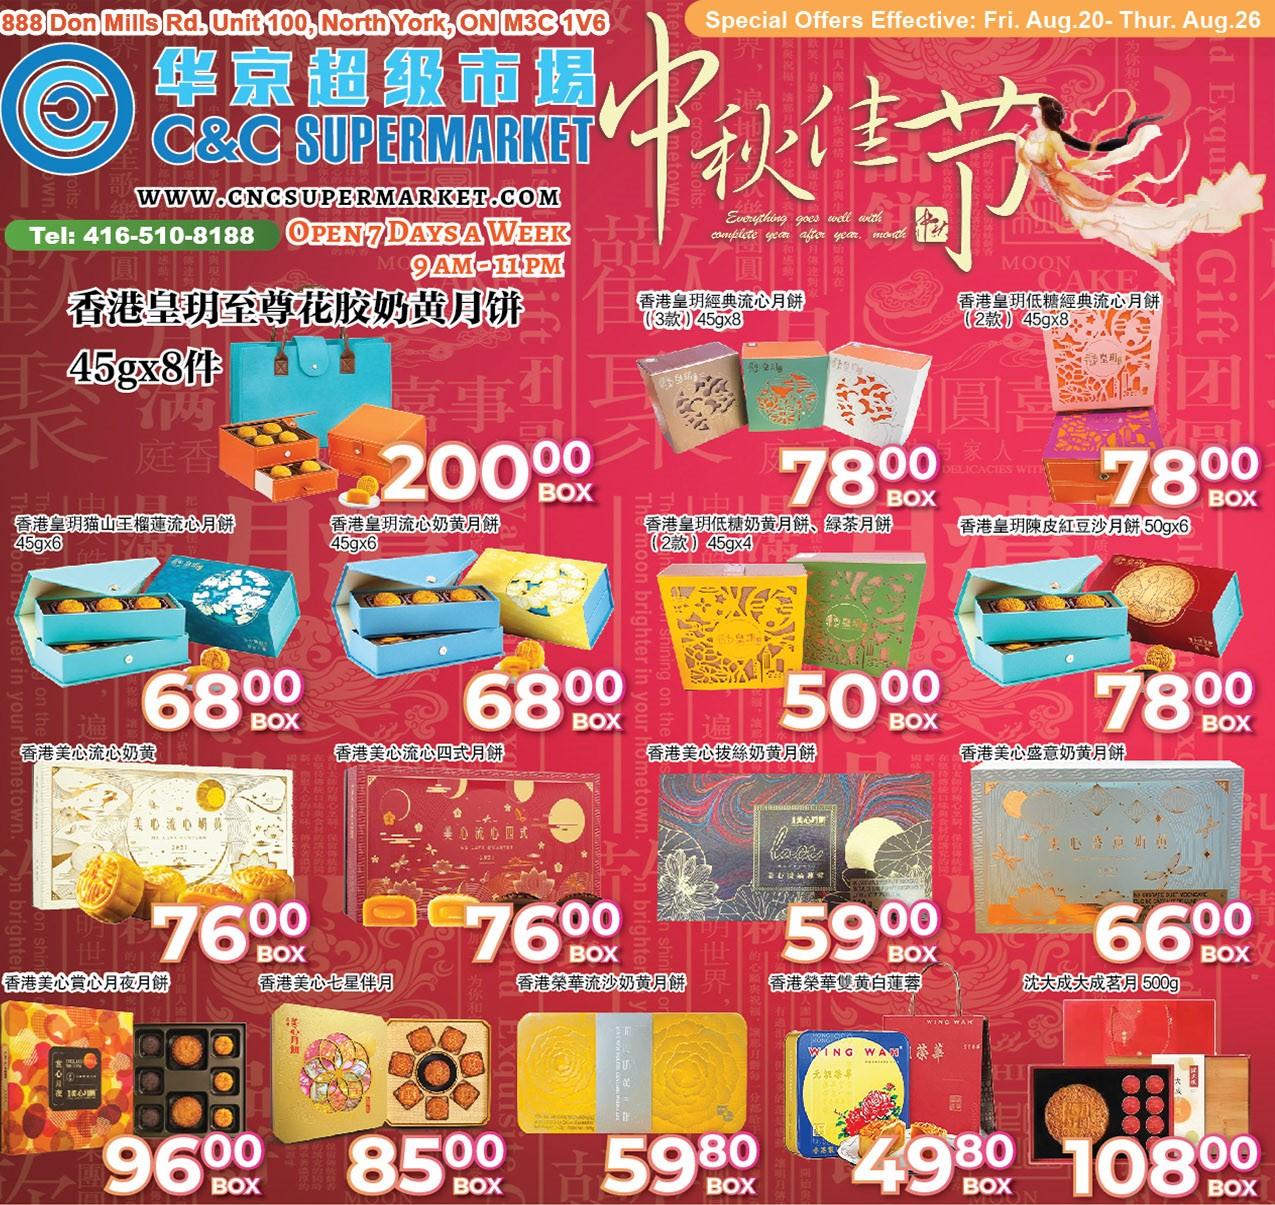 C&C Supermarket Flyer | Aug 20